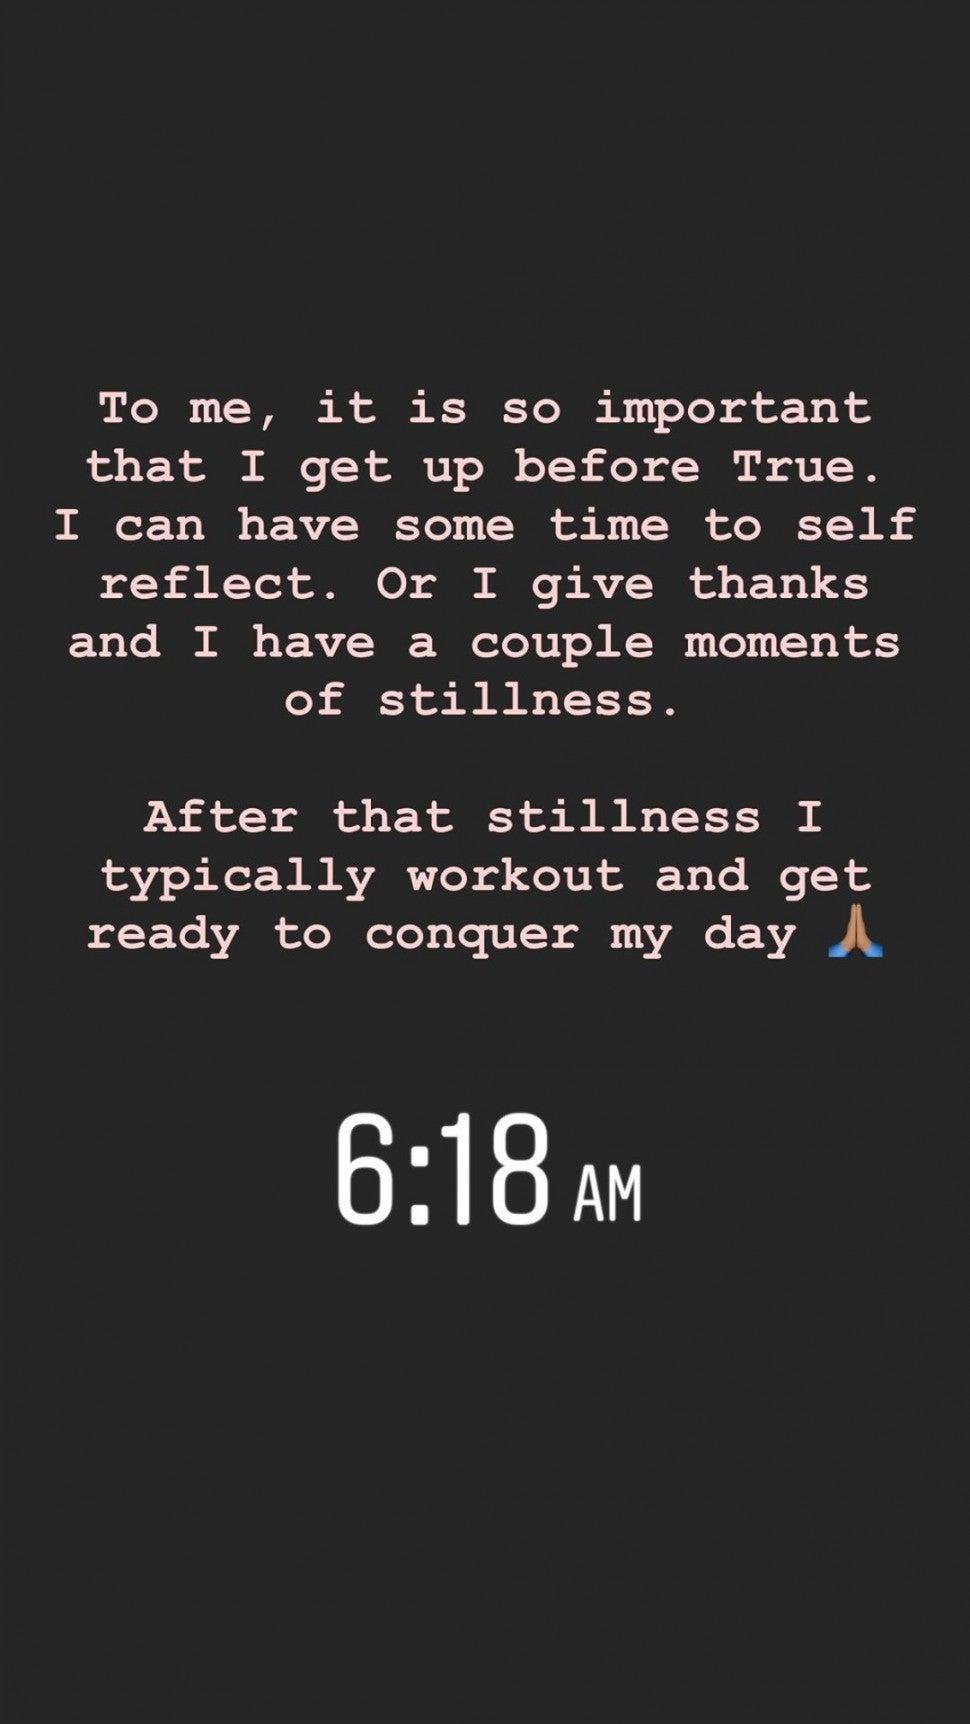 Khloe Kardashian's message